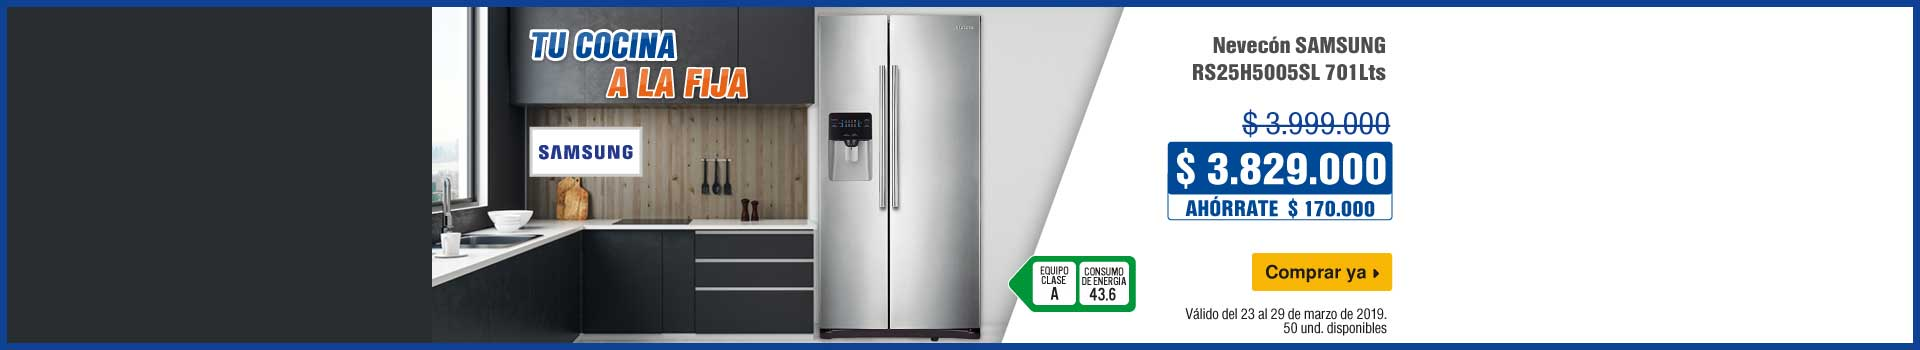 AK-KT-mayores-3-ELECT-BCAT-refrigeracion-samsung-230319